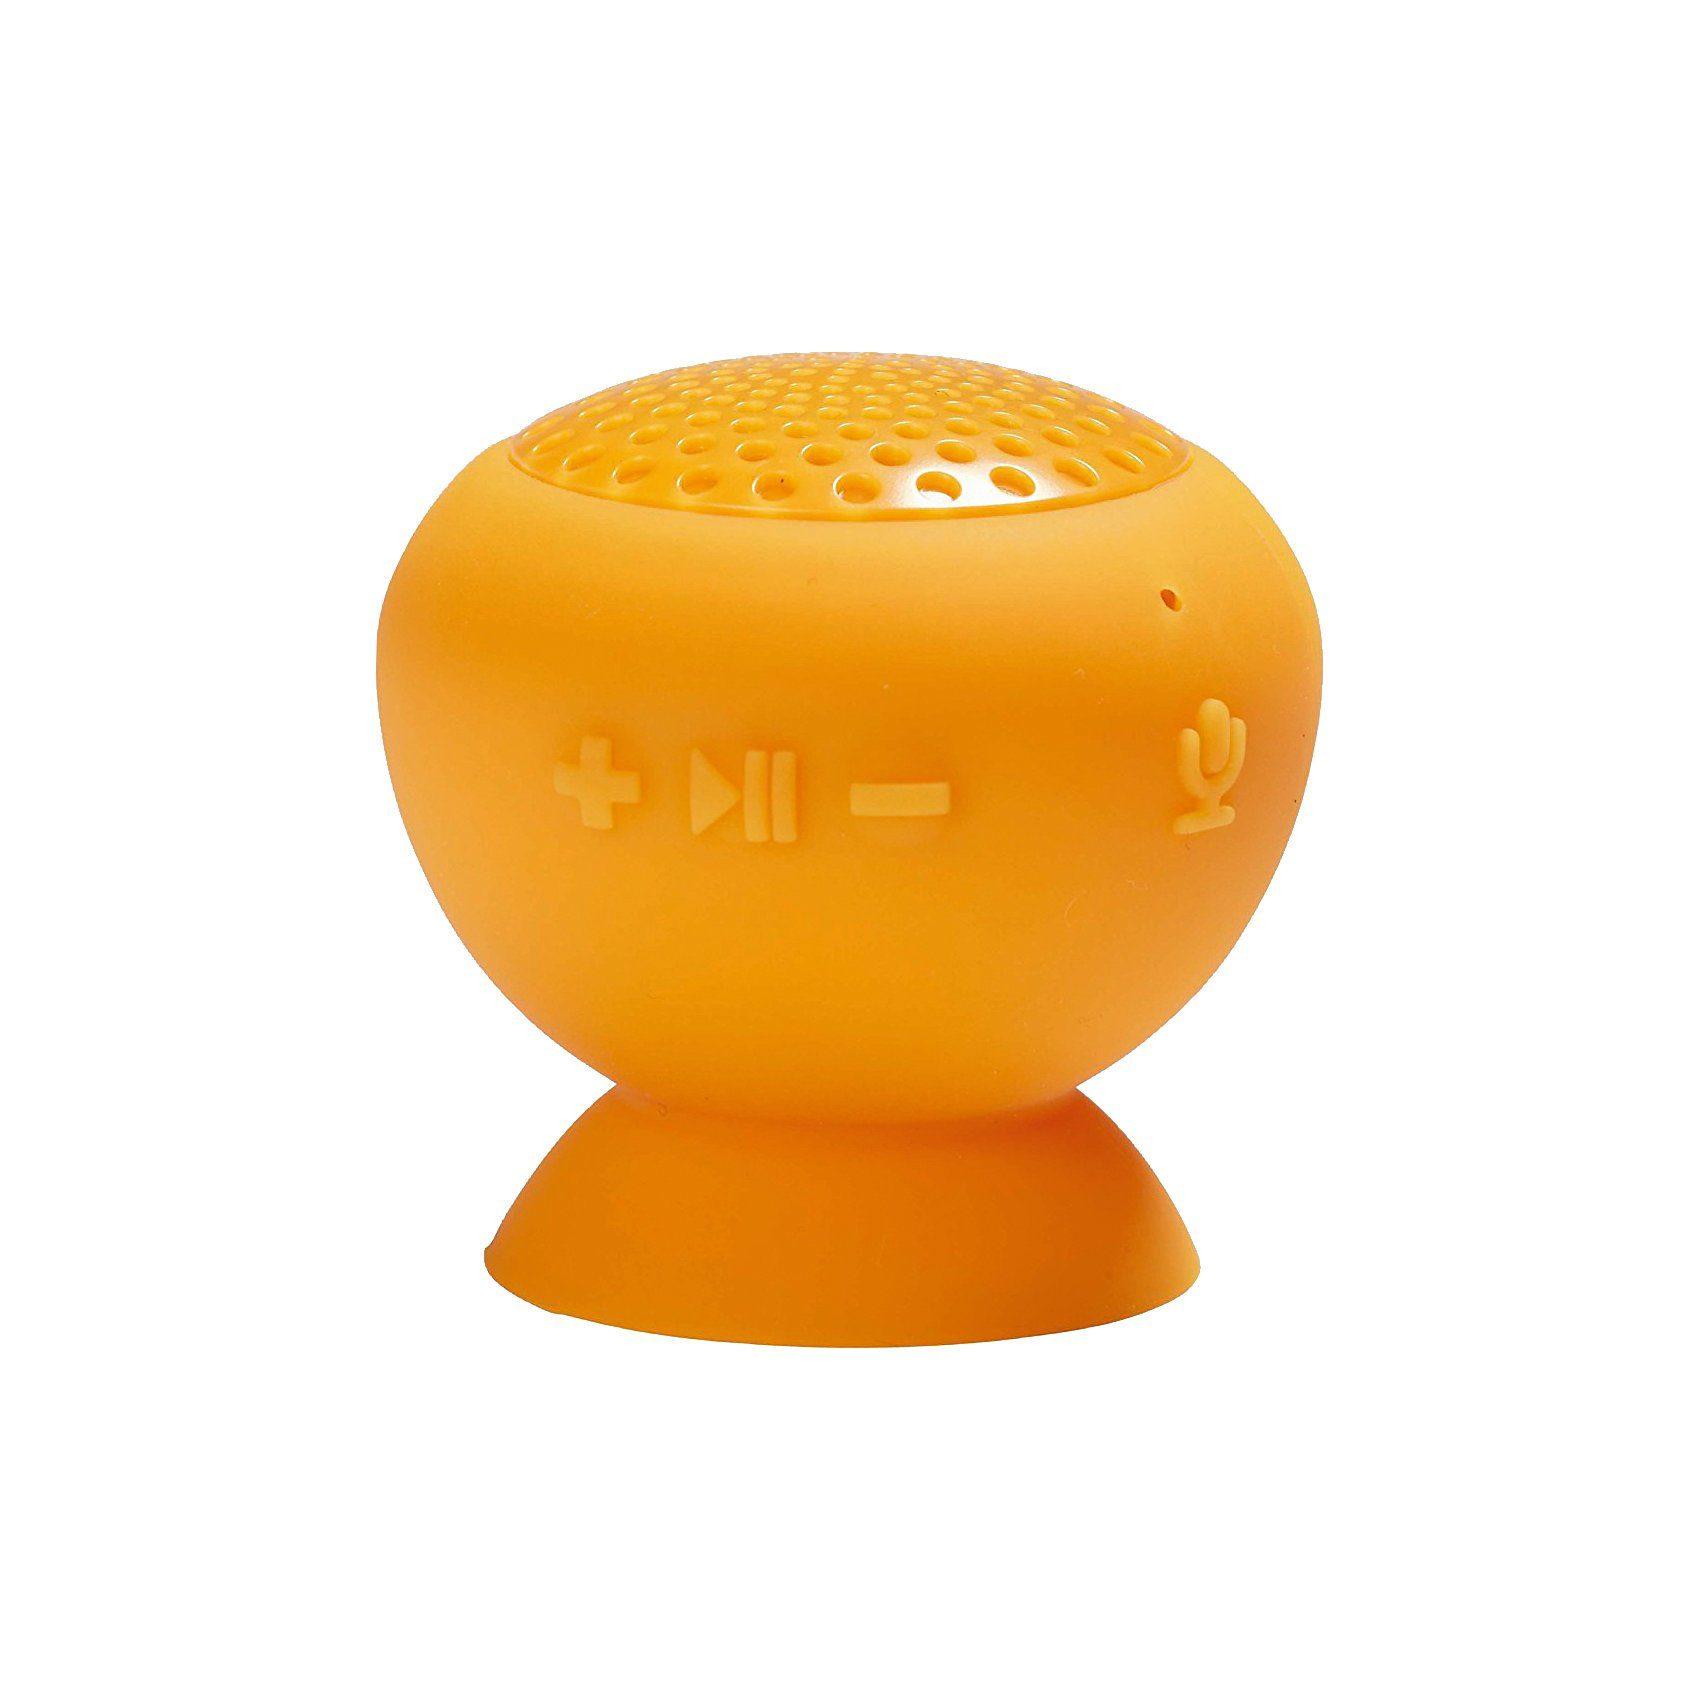 Freecom Waterproof Bluetooth Lautsprecher